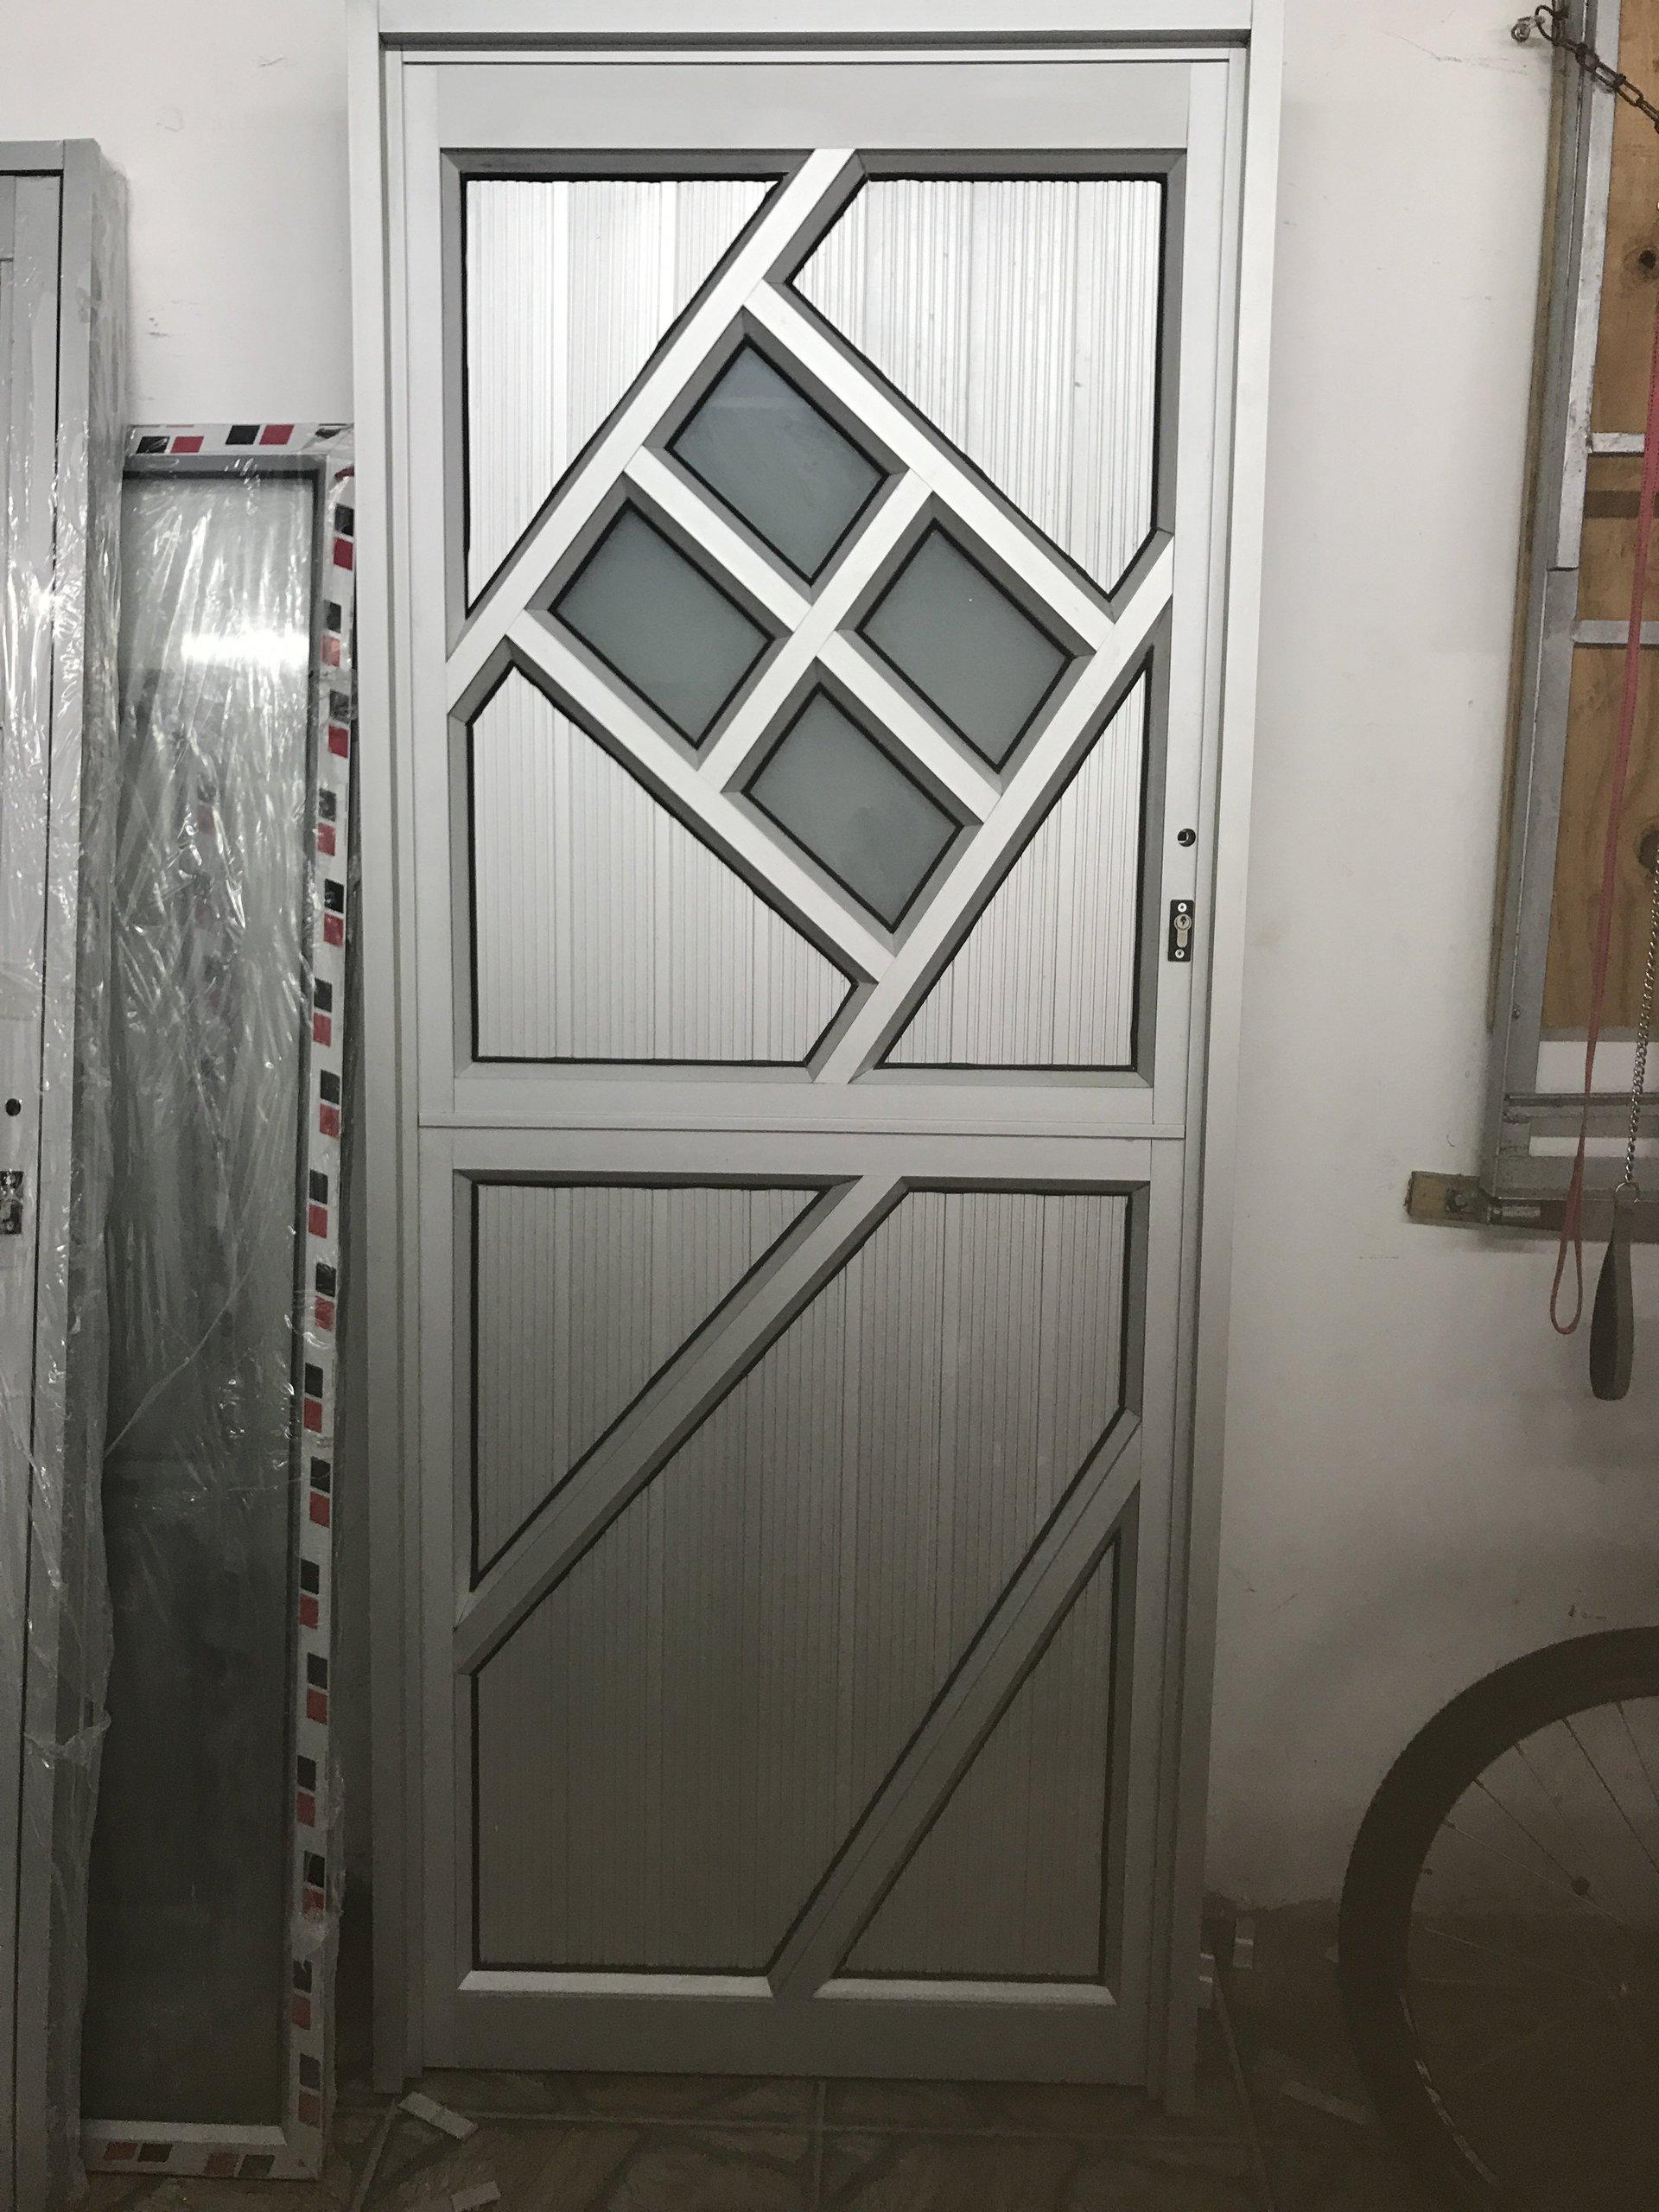 Doors prices glass door price glass door price suppliers and manufacturers at - Kitchen sliding door price ...